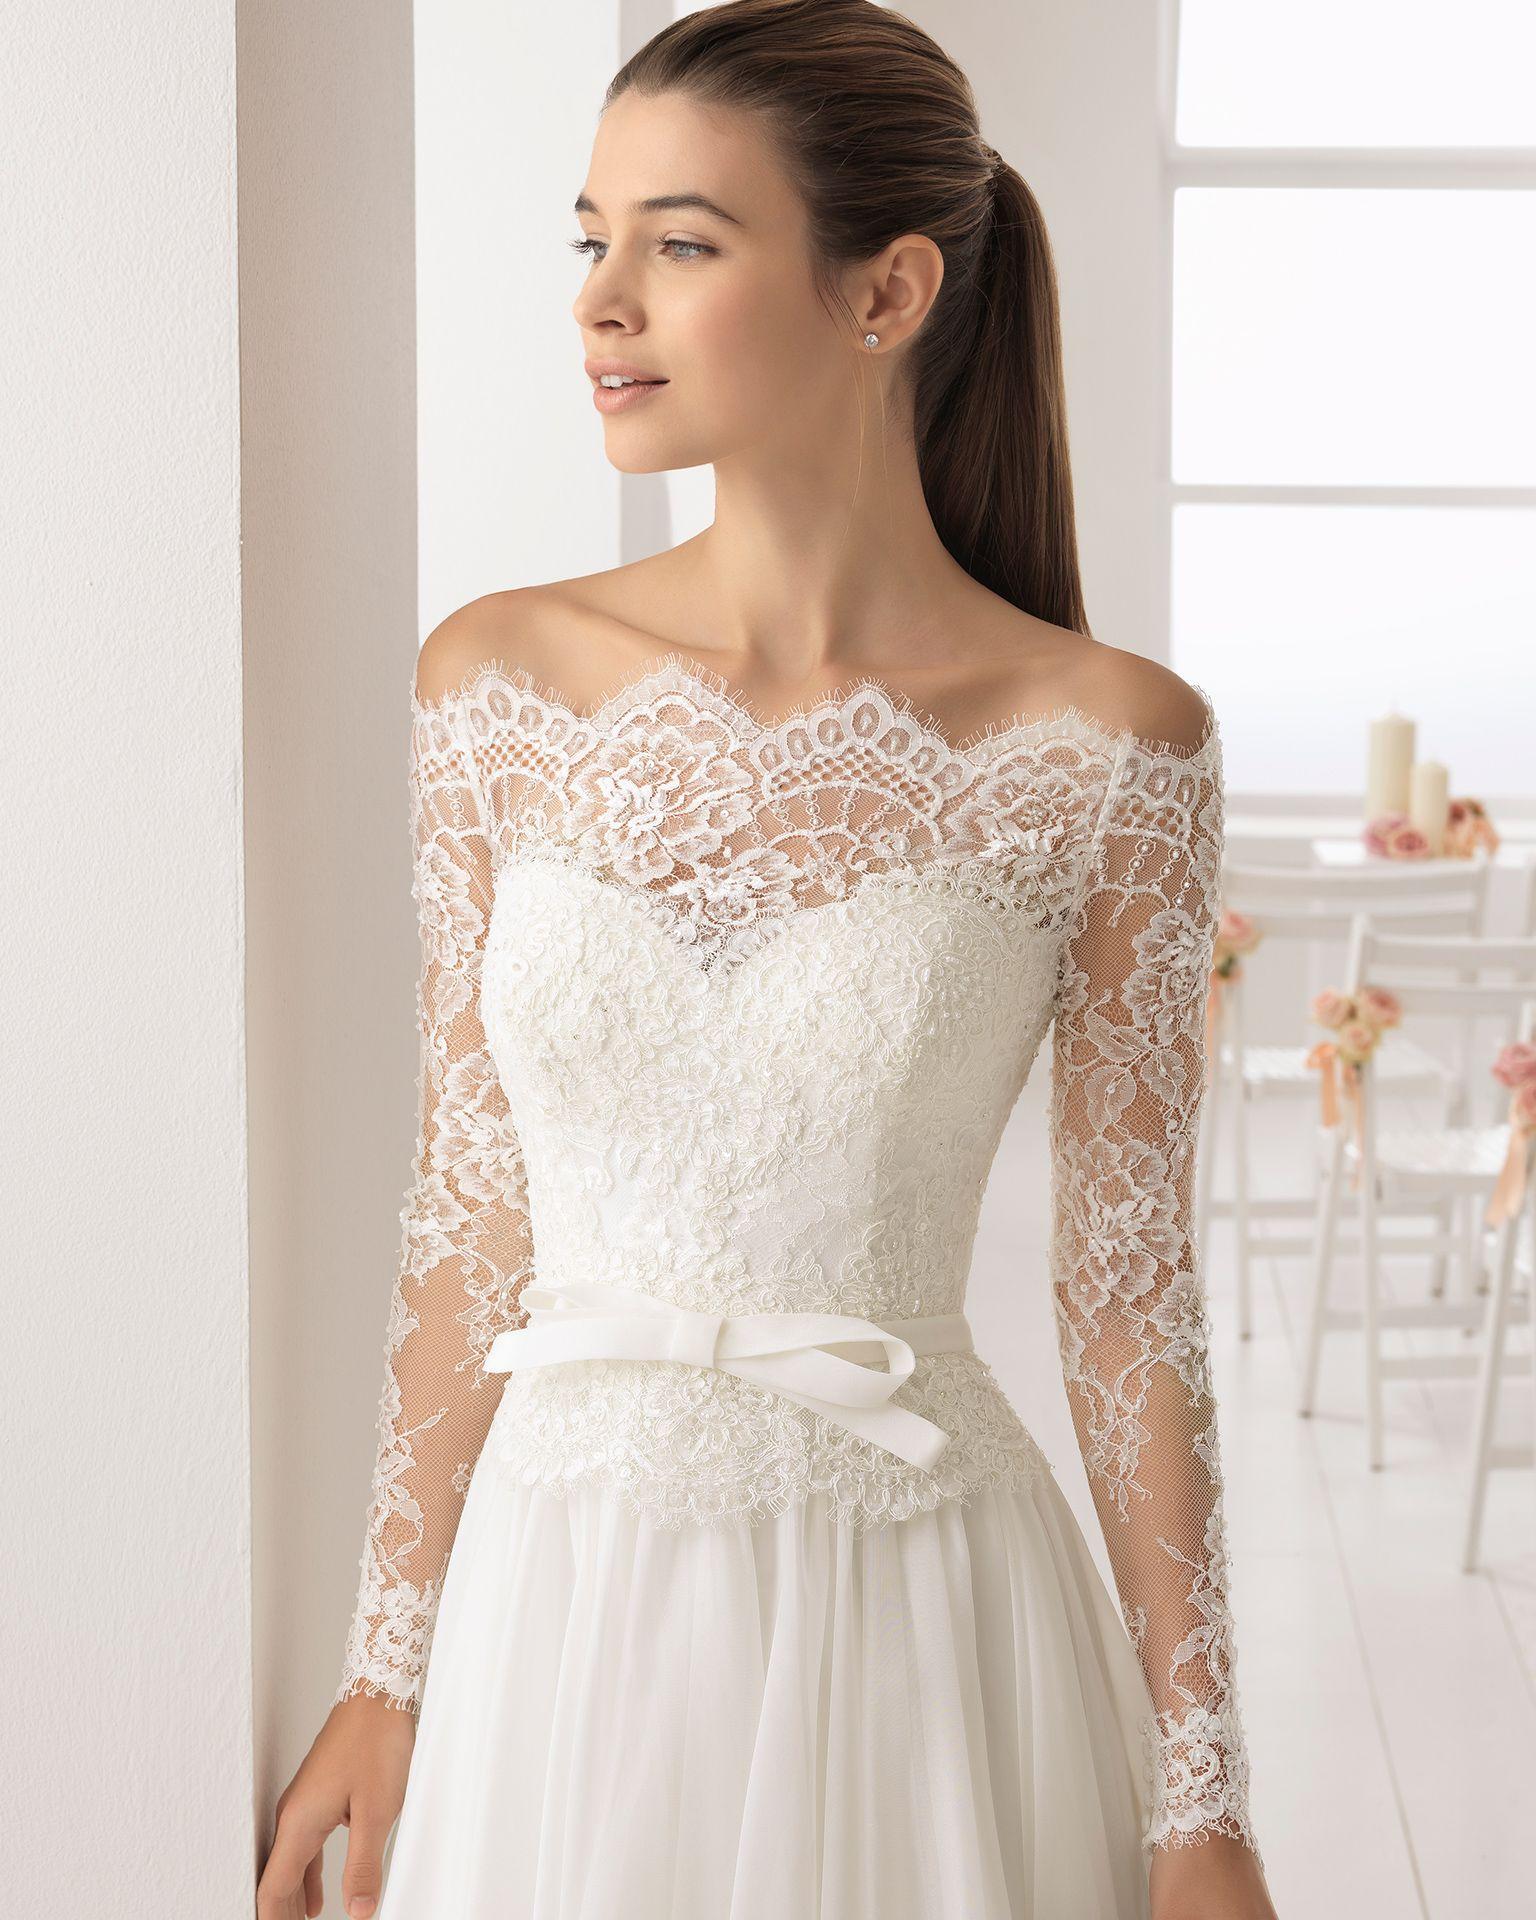 Vestidos de novia estilo romanticos